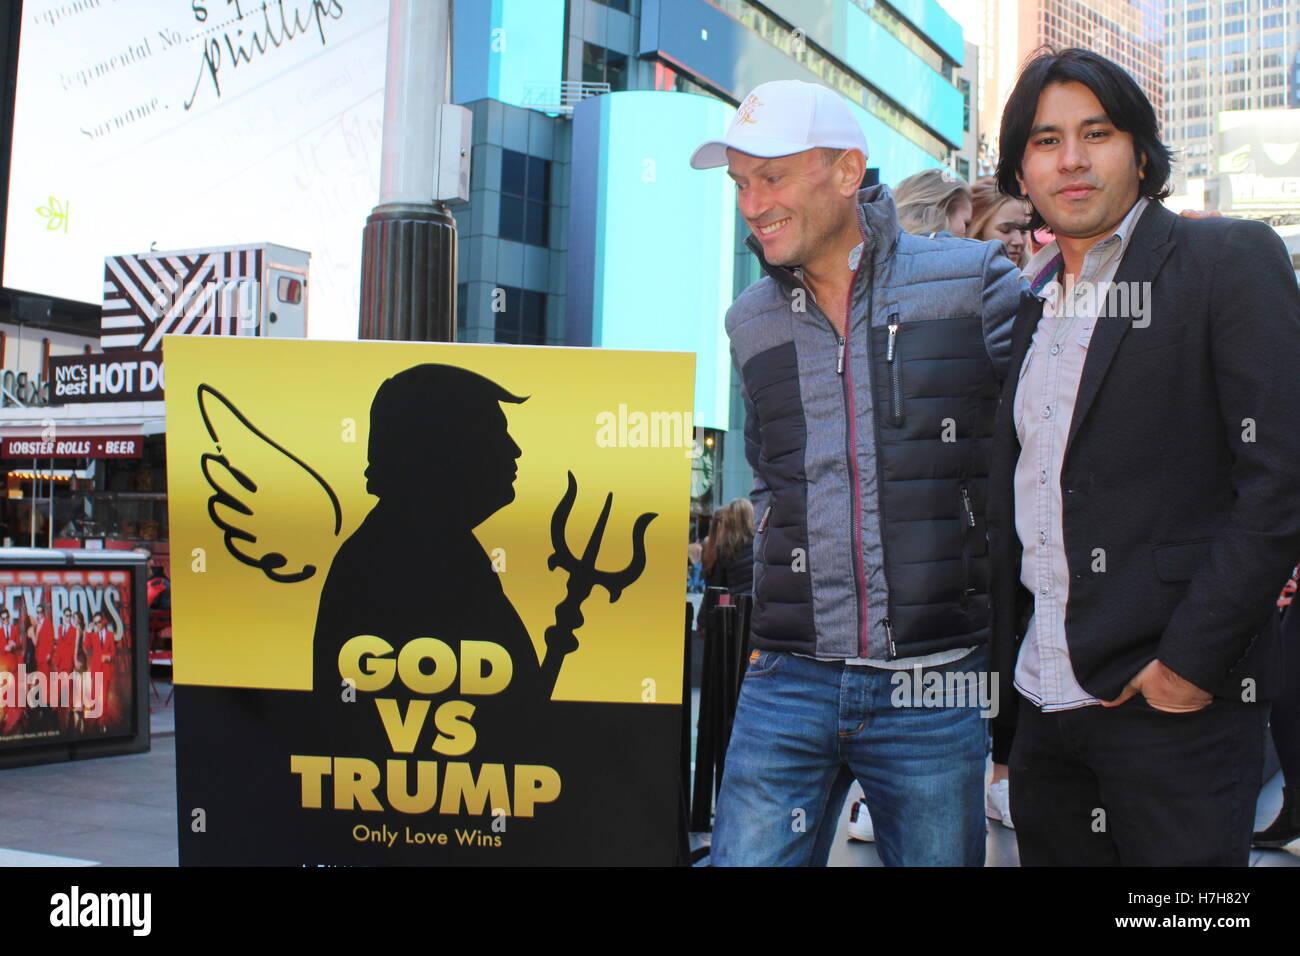 New York City, New York, US. 5th Nov, 2016. British director MARTIN DUNKERTON in New York's Times Square self - Stock Image